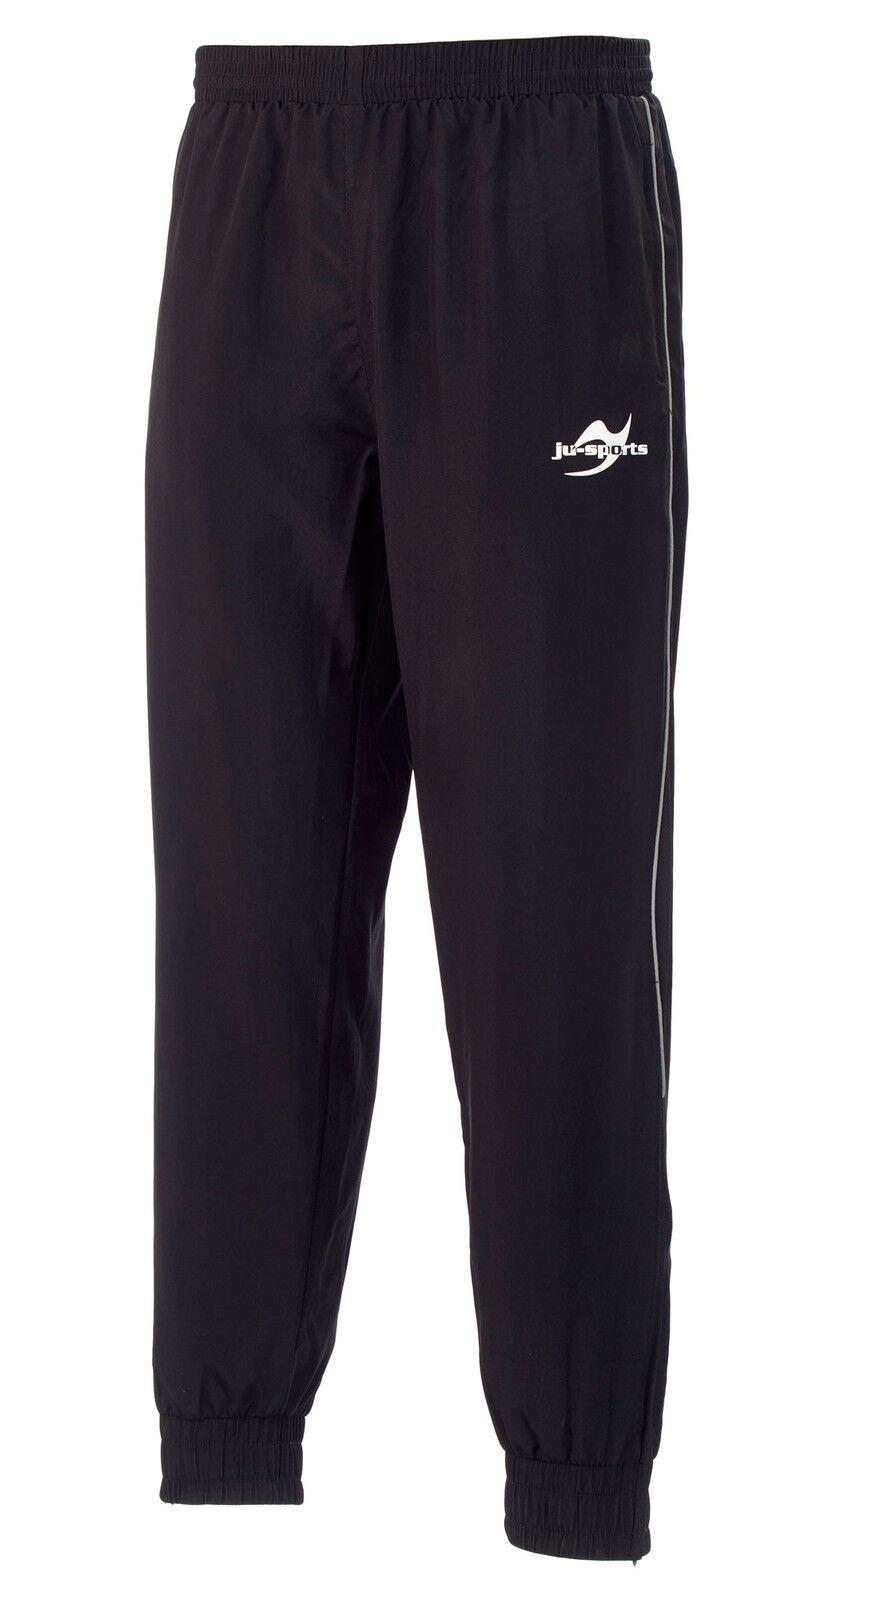 Ju-Sports Teamwear Element C2 Hose schwarz schwarz schwarz Sporthose Trainingshose Team Wear  | Ausgezeichnetes Preis  833b10